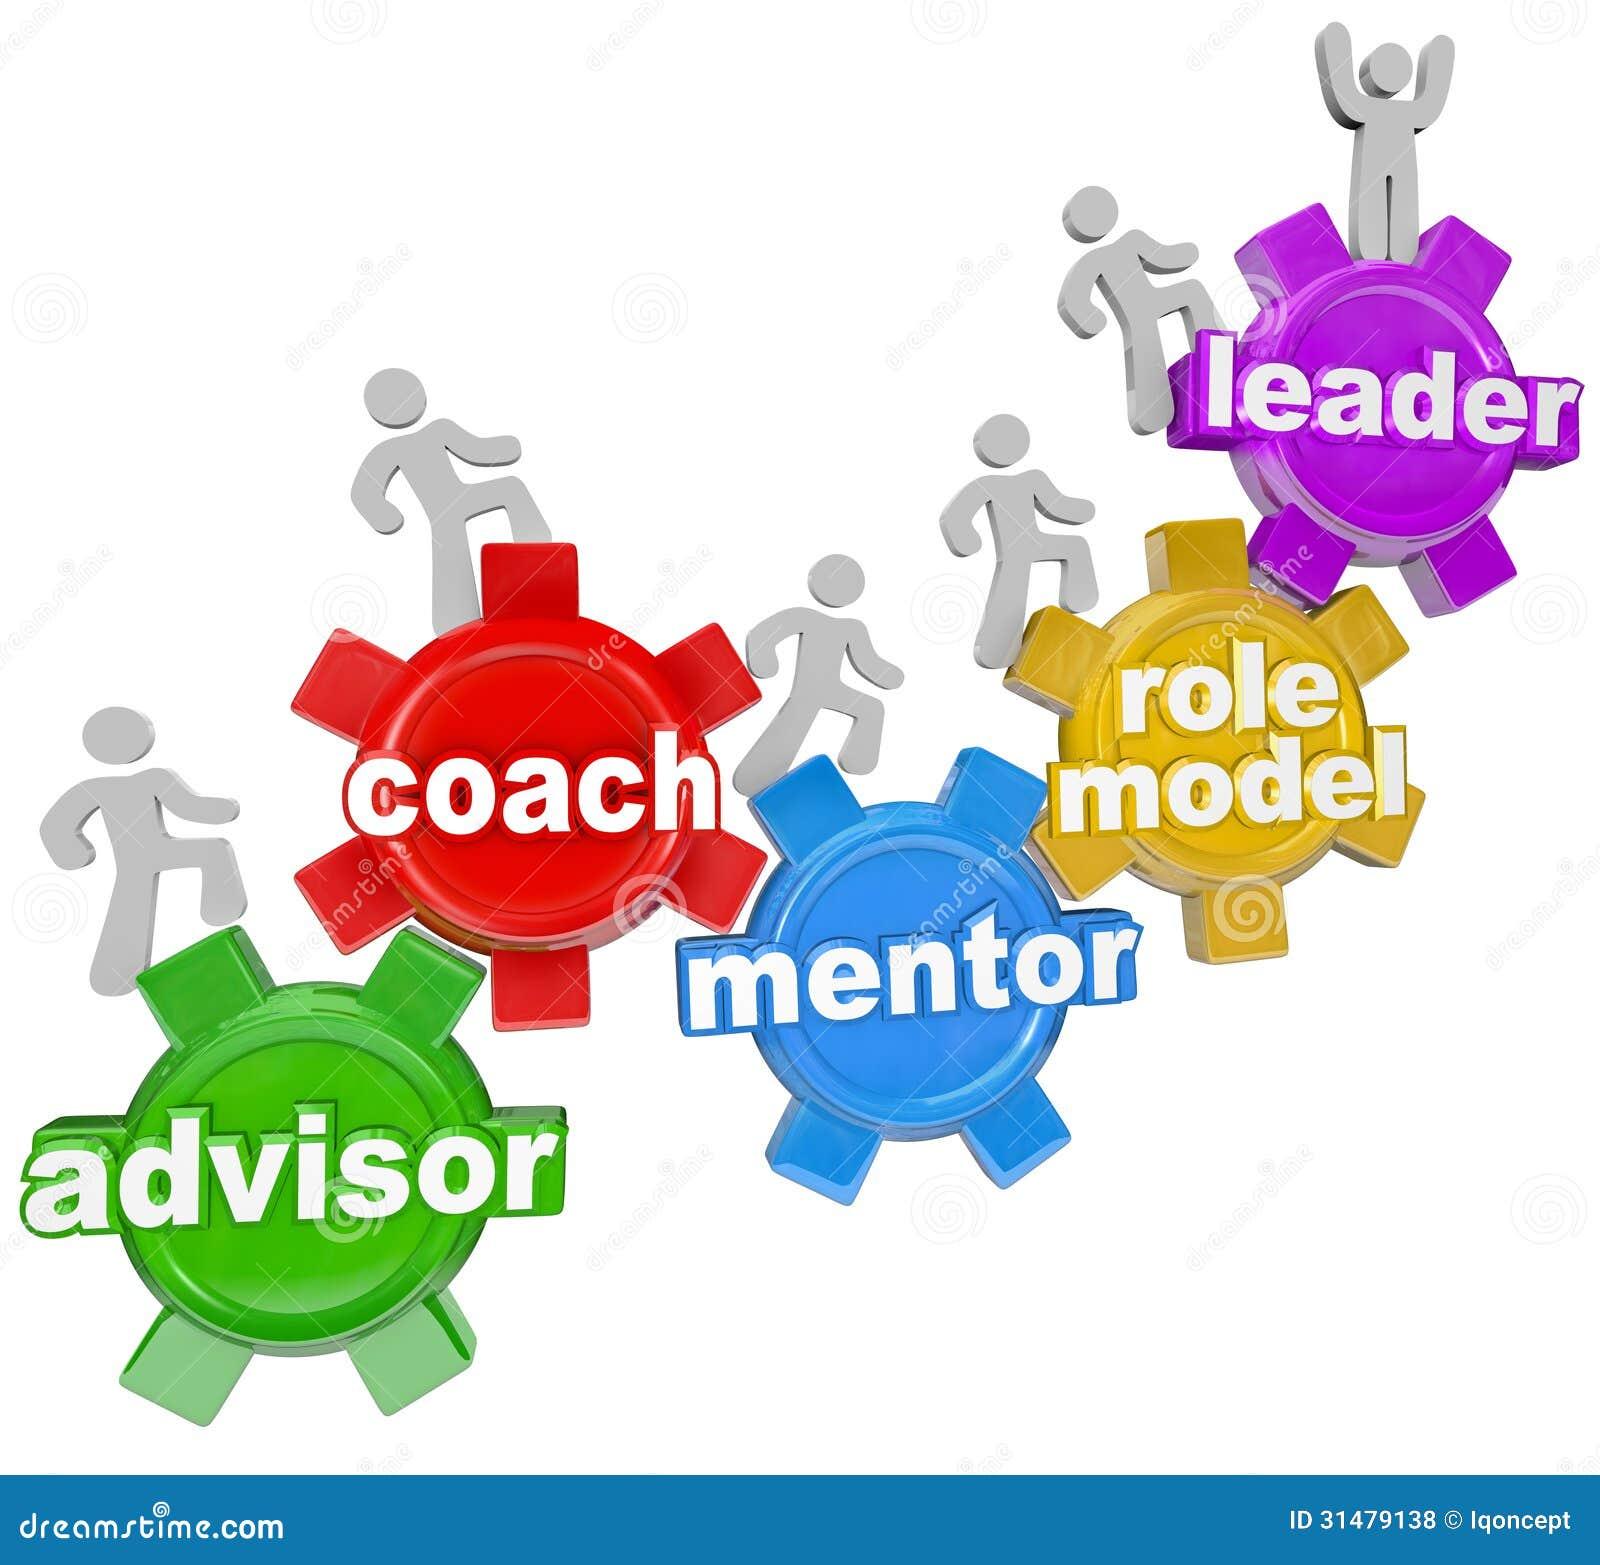 mentoring teacher quotes